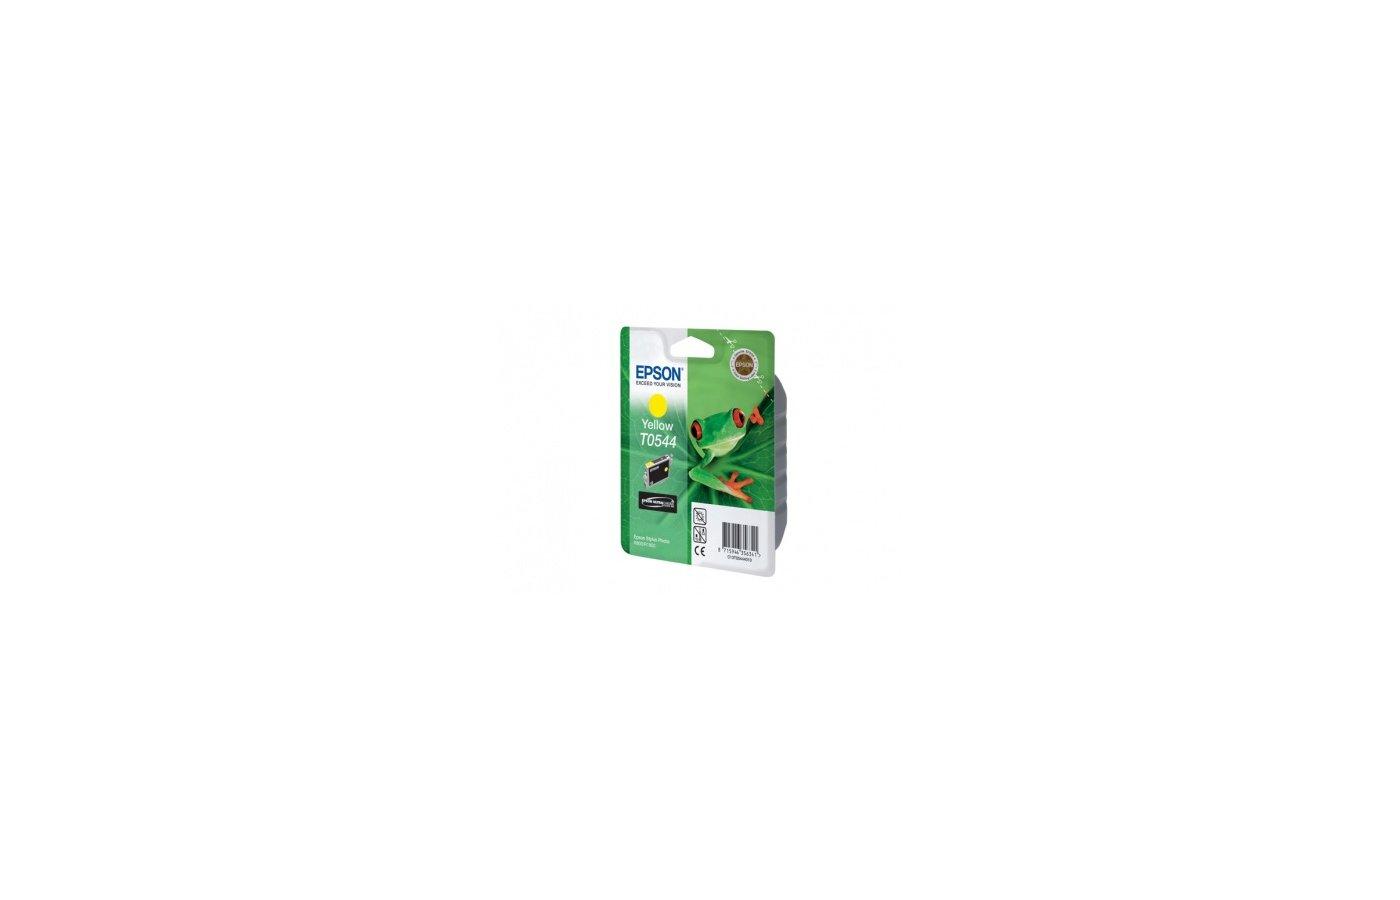 Картридж струйный Epson C13T054440 желтый для Stylus Photo R800